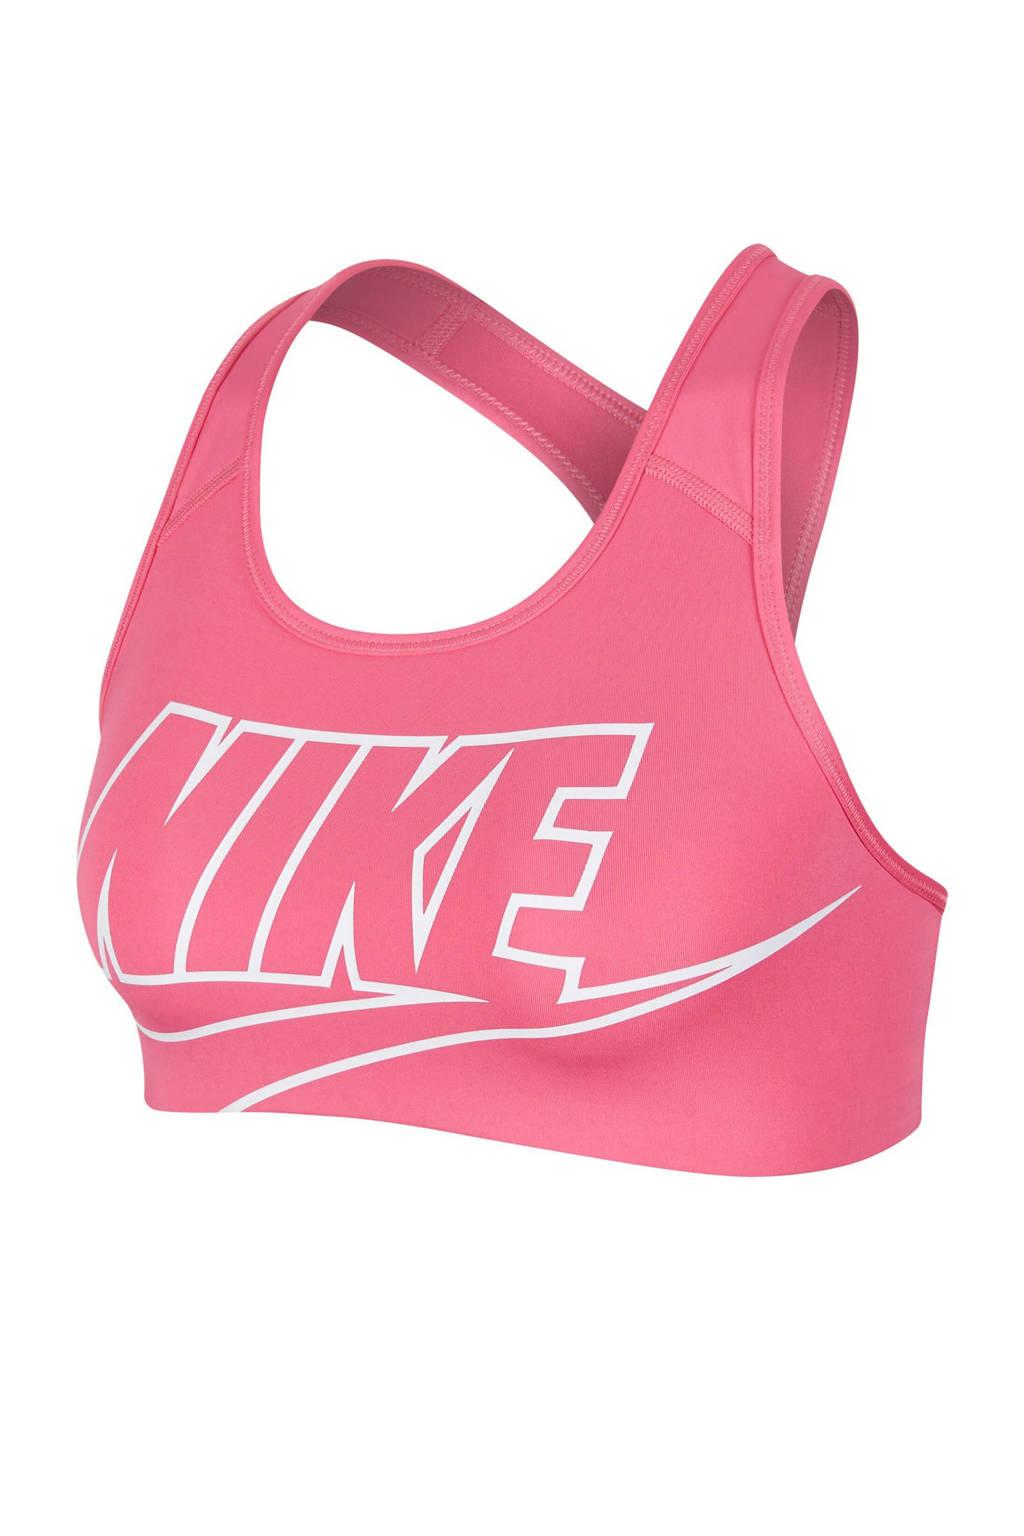 Nike level 2 sportbh roze, Roze